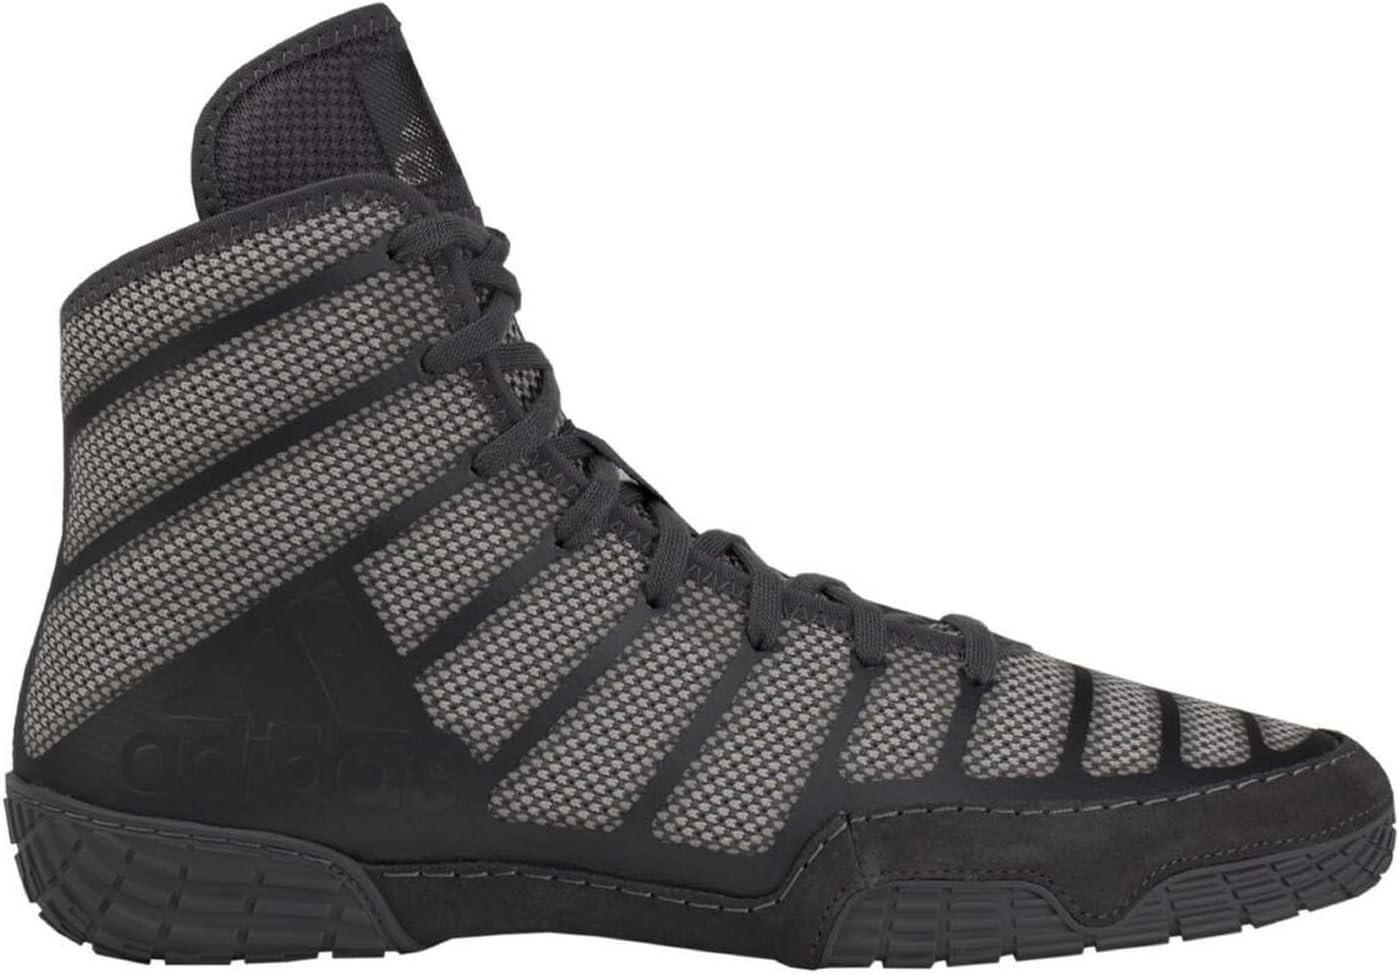 adidas Adizero Varner Black Grey Wrestling Shoes (AC7497)